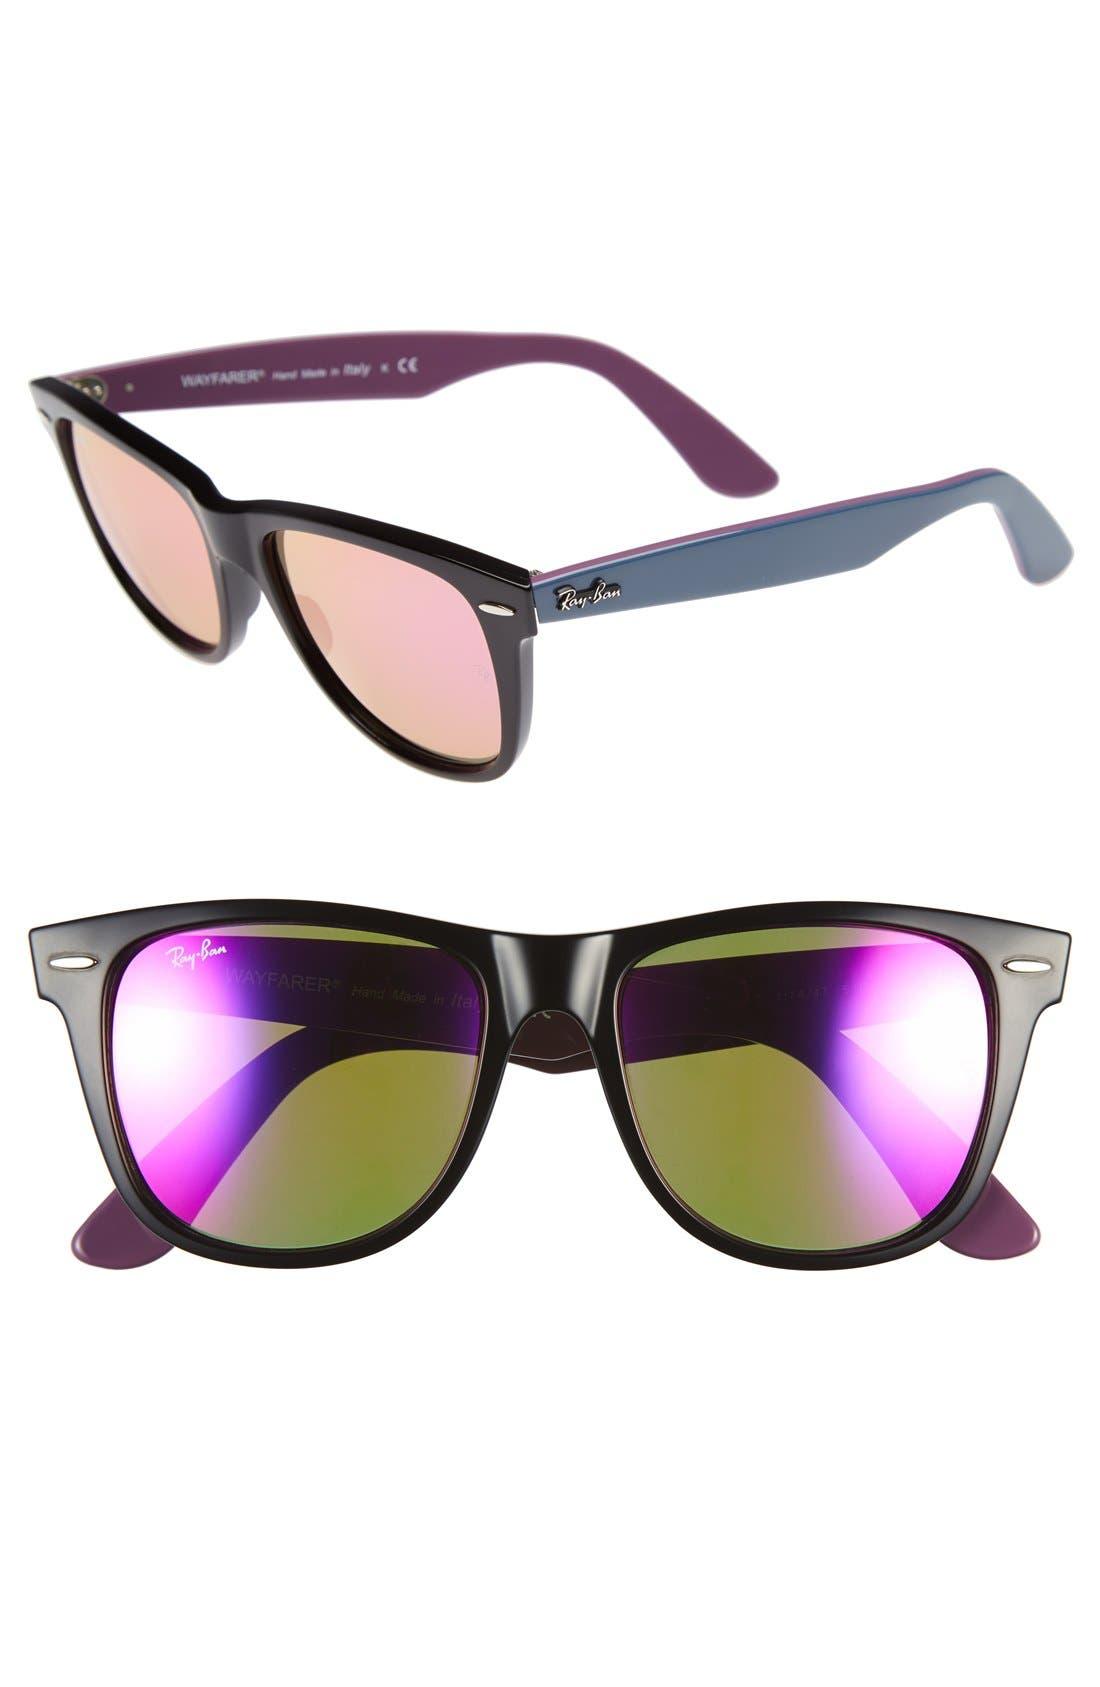 Main Image - Ray-Ban 'Wayfarer' 54mm Sunglasses